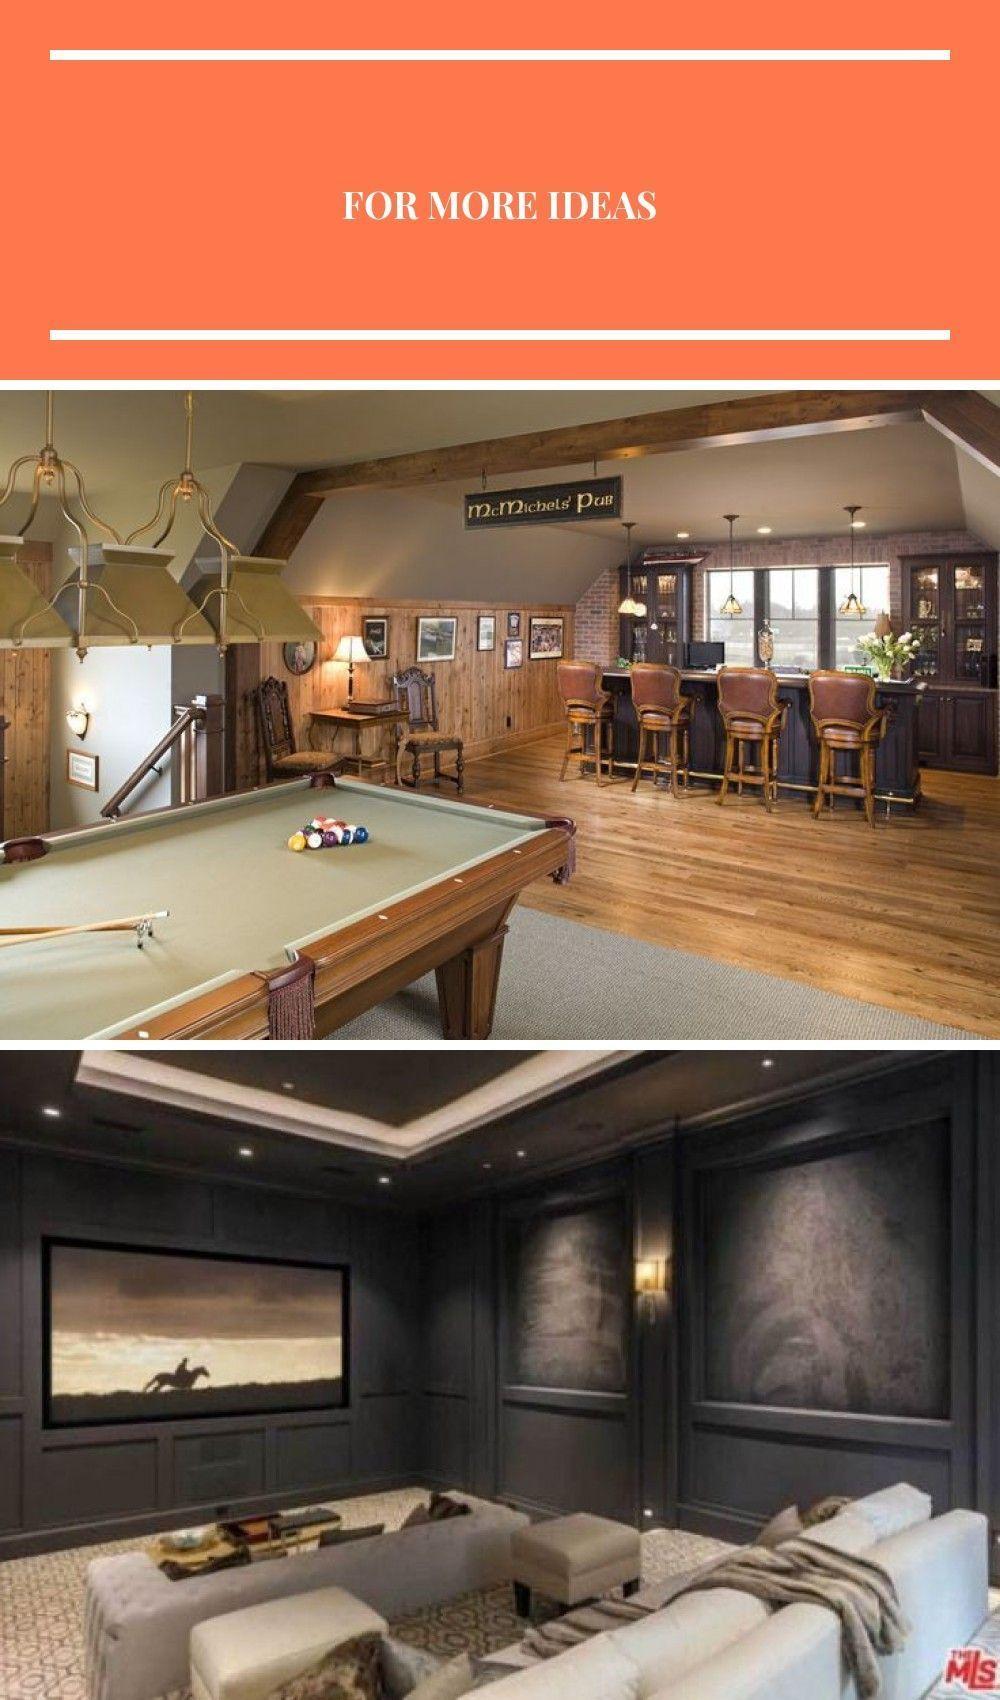 Photo of 21 Amazing and Unbelievable Recreational Room Ideas,  #Amazing #ideas #Recreatio…,  #Amazin…